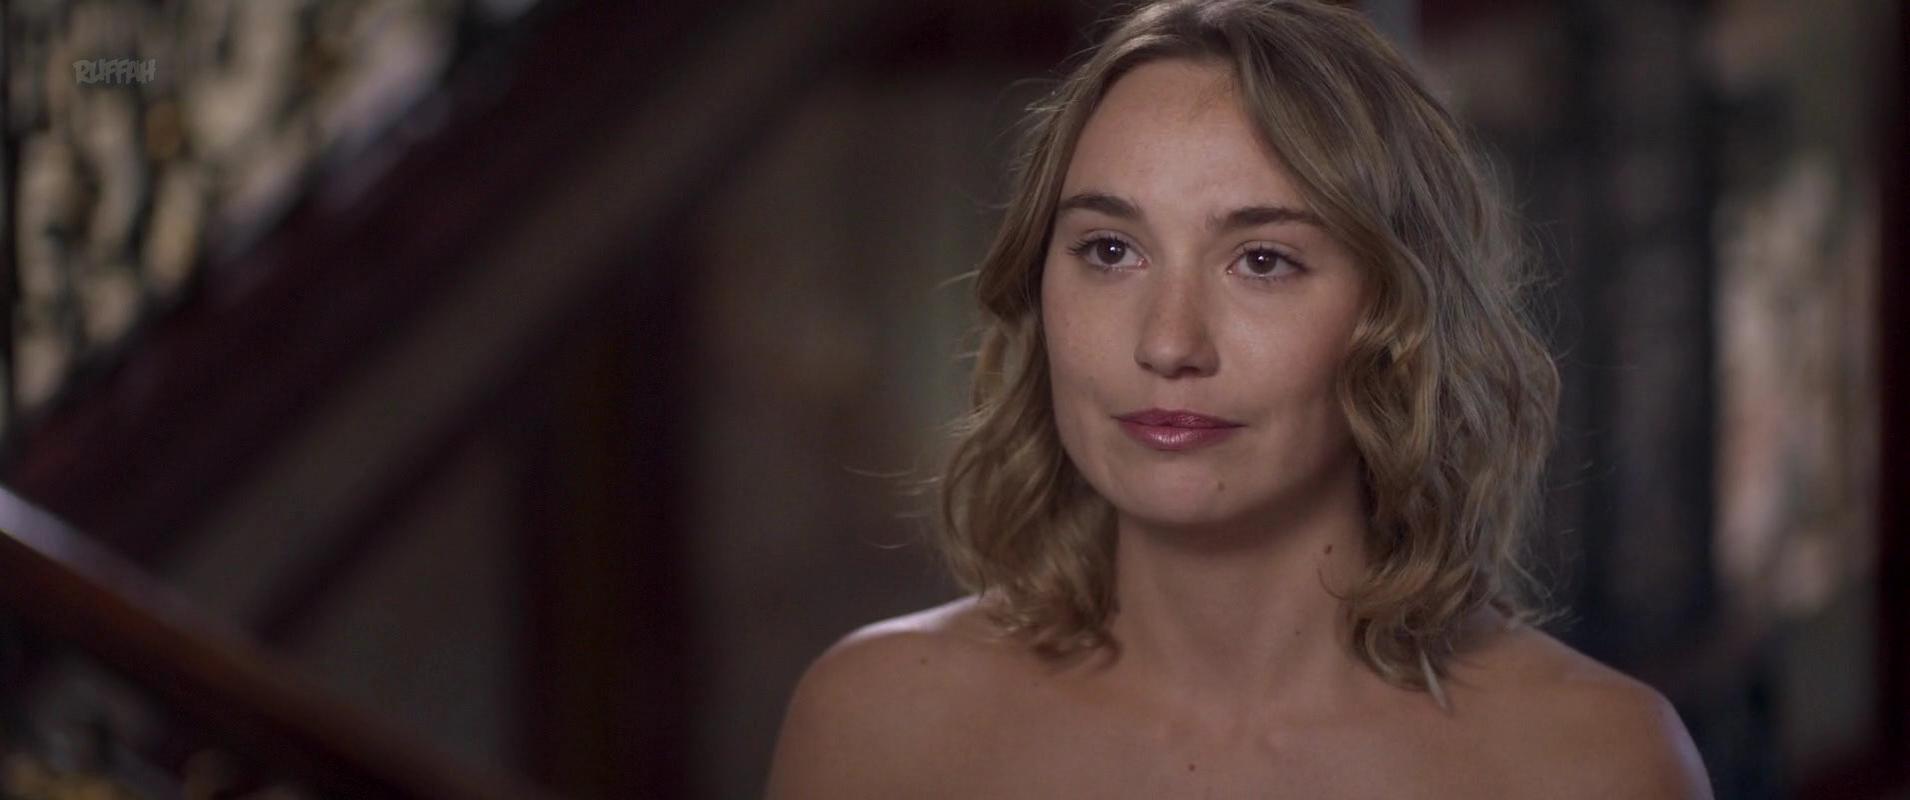 Deborah Francois nude - Loue Moi (2017)